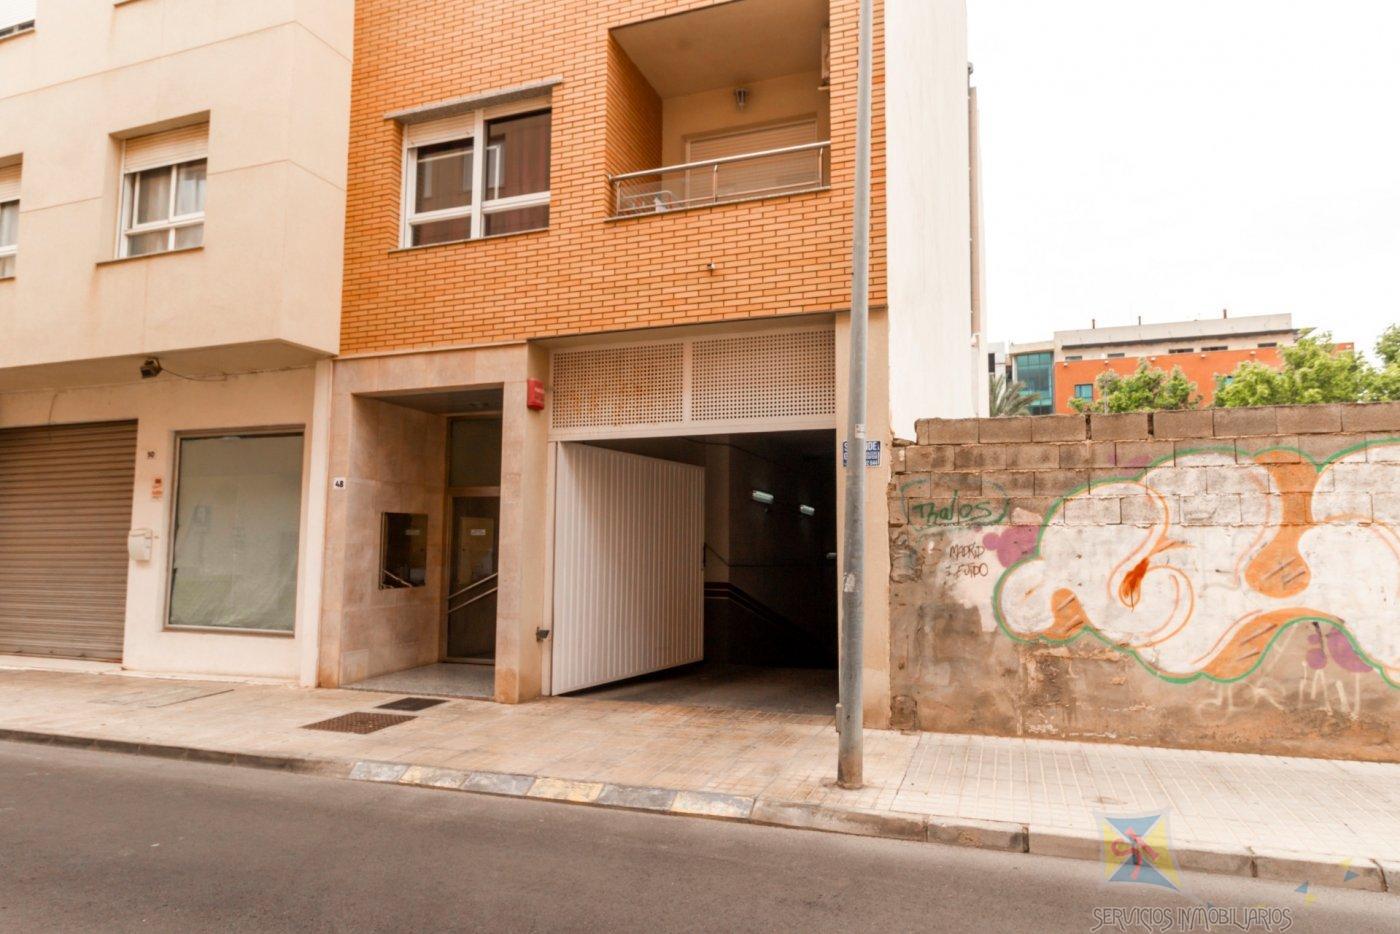 For sale of garage in El Ejido